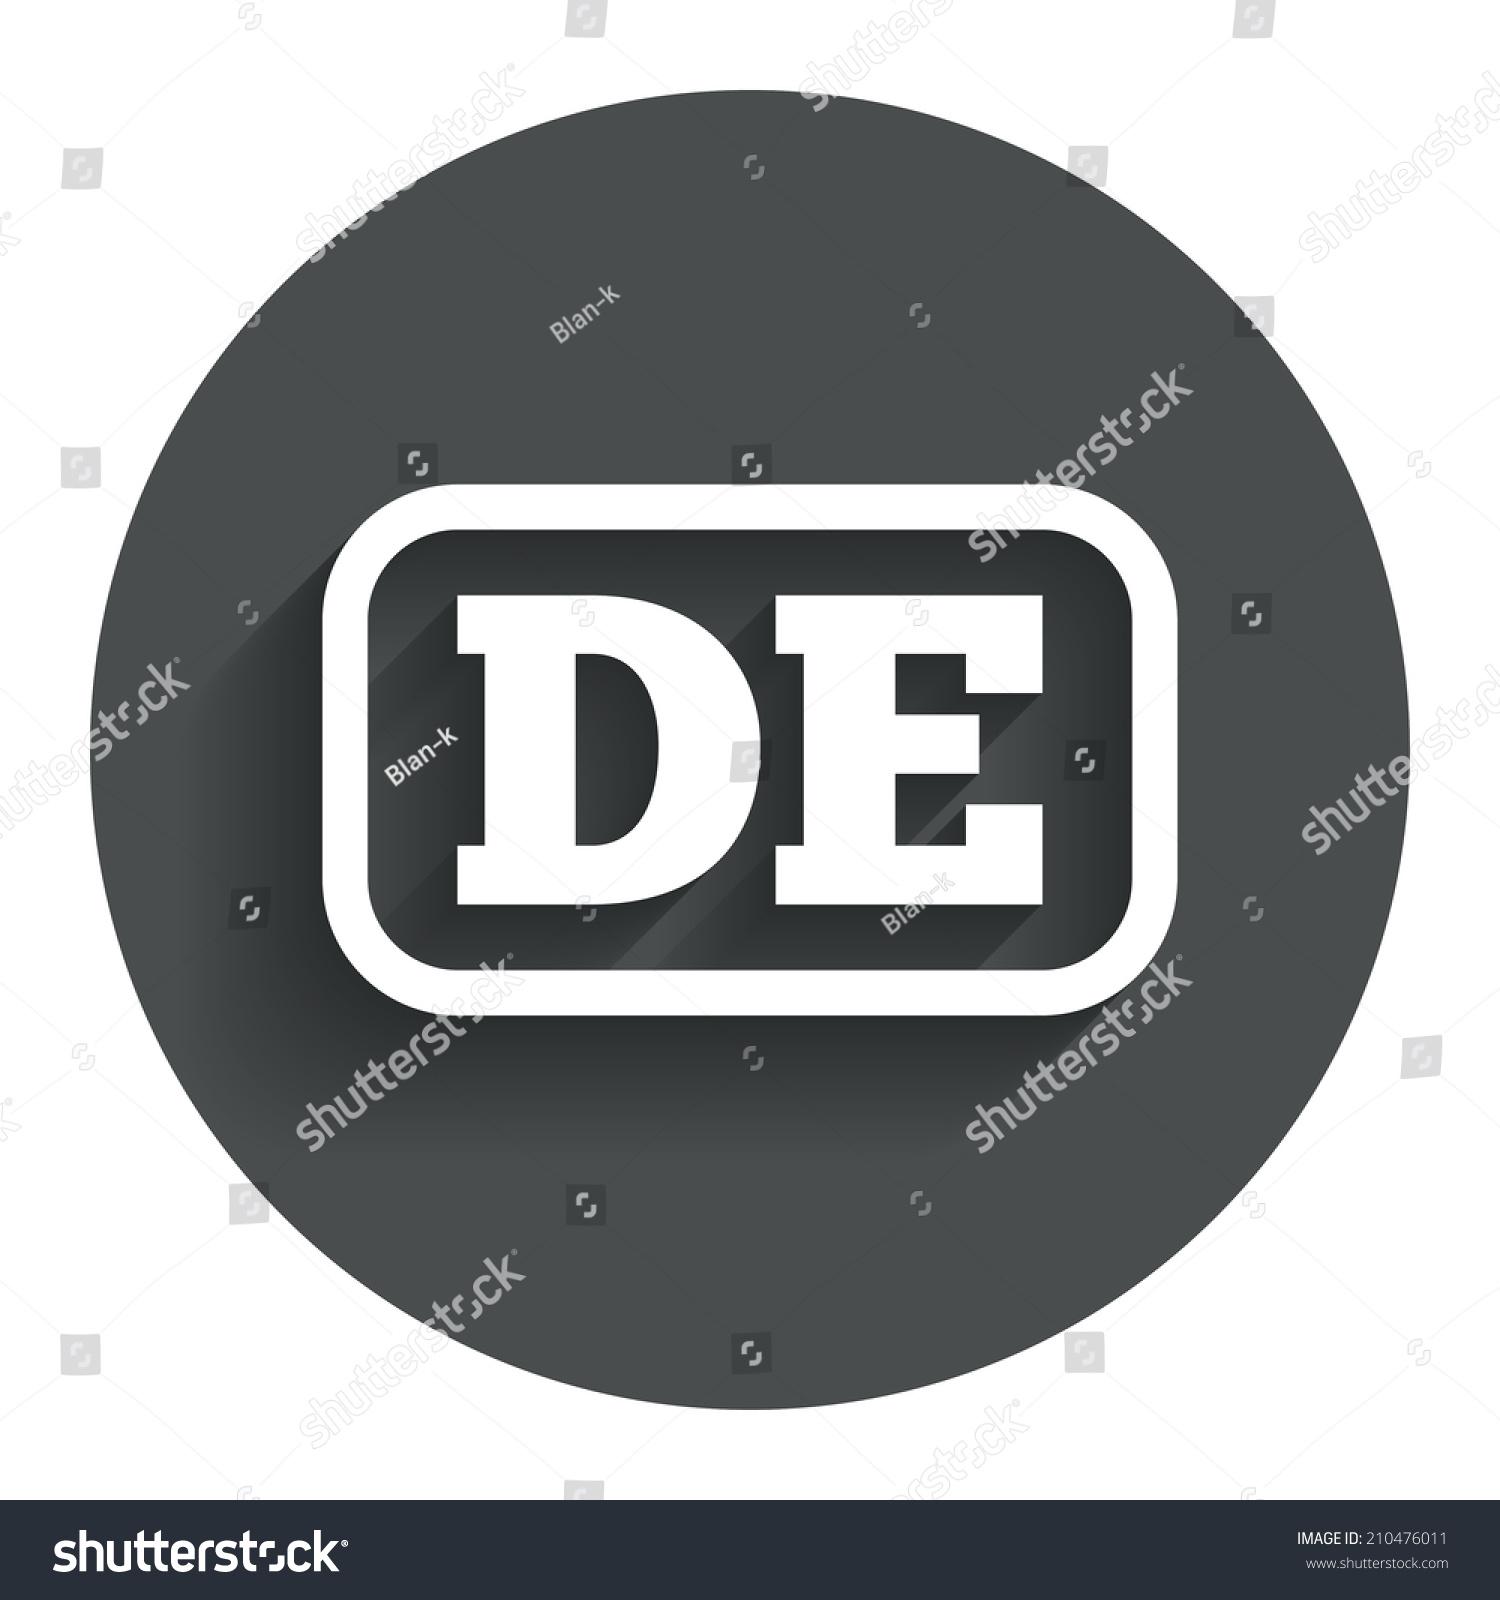 German language sign icon de deutschland stock illustration de deutschland translation symbol with frame circle flat button with biocorpaavc